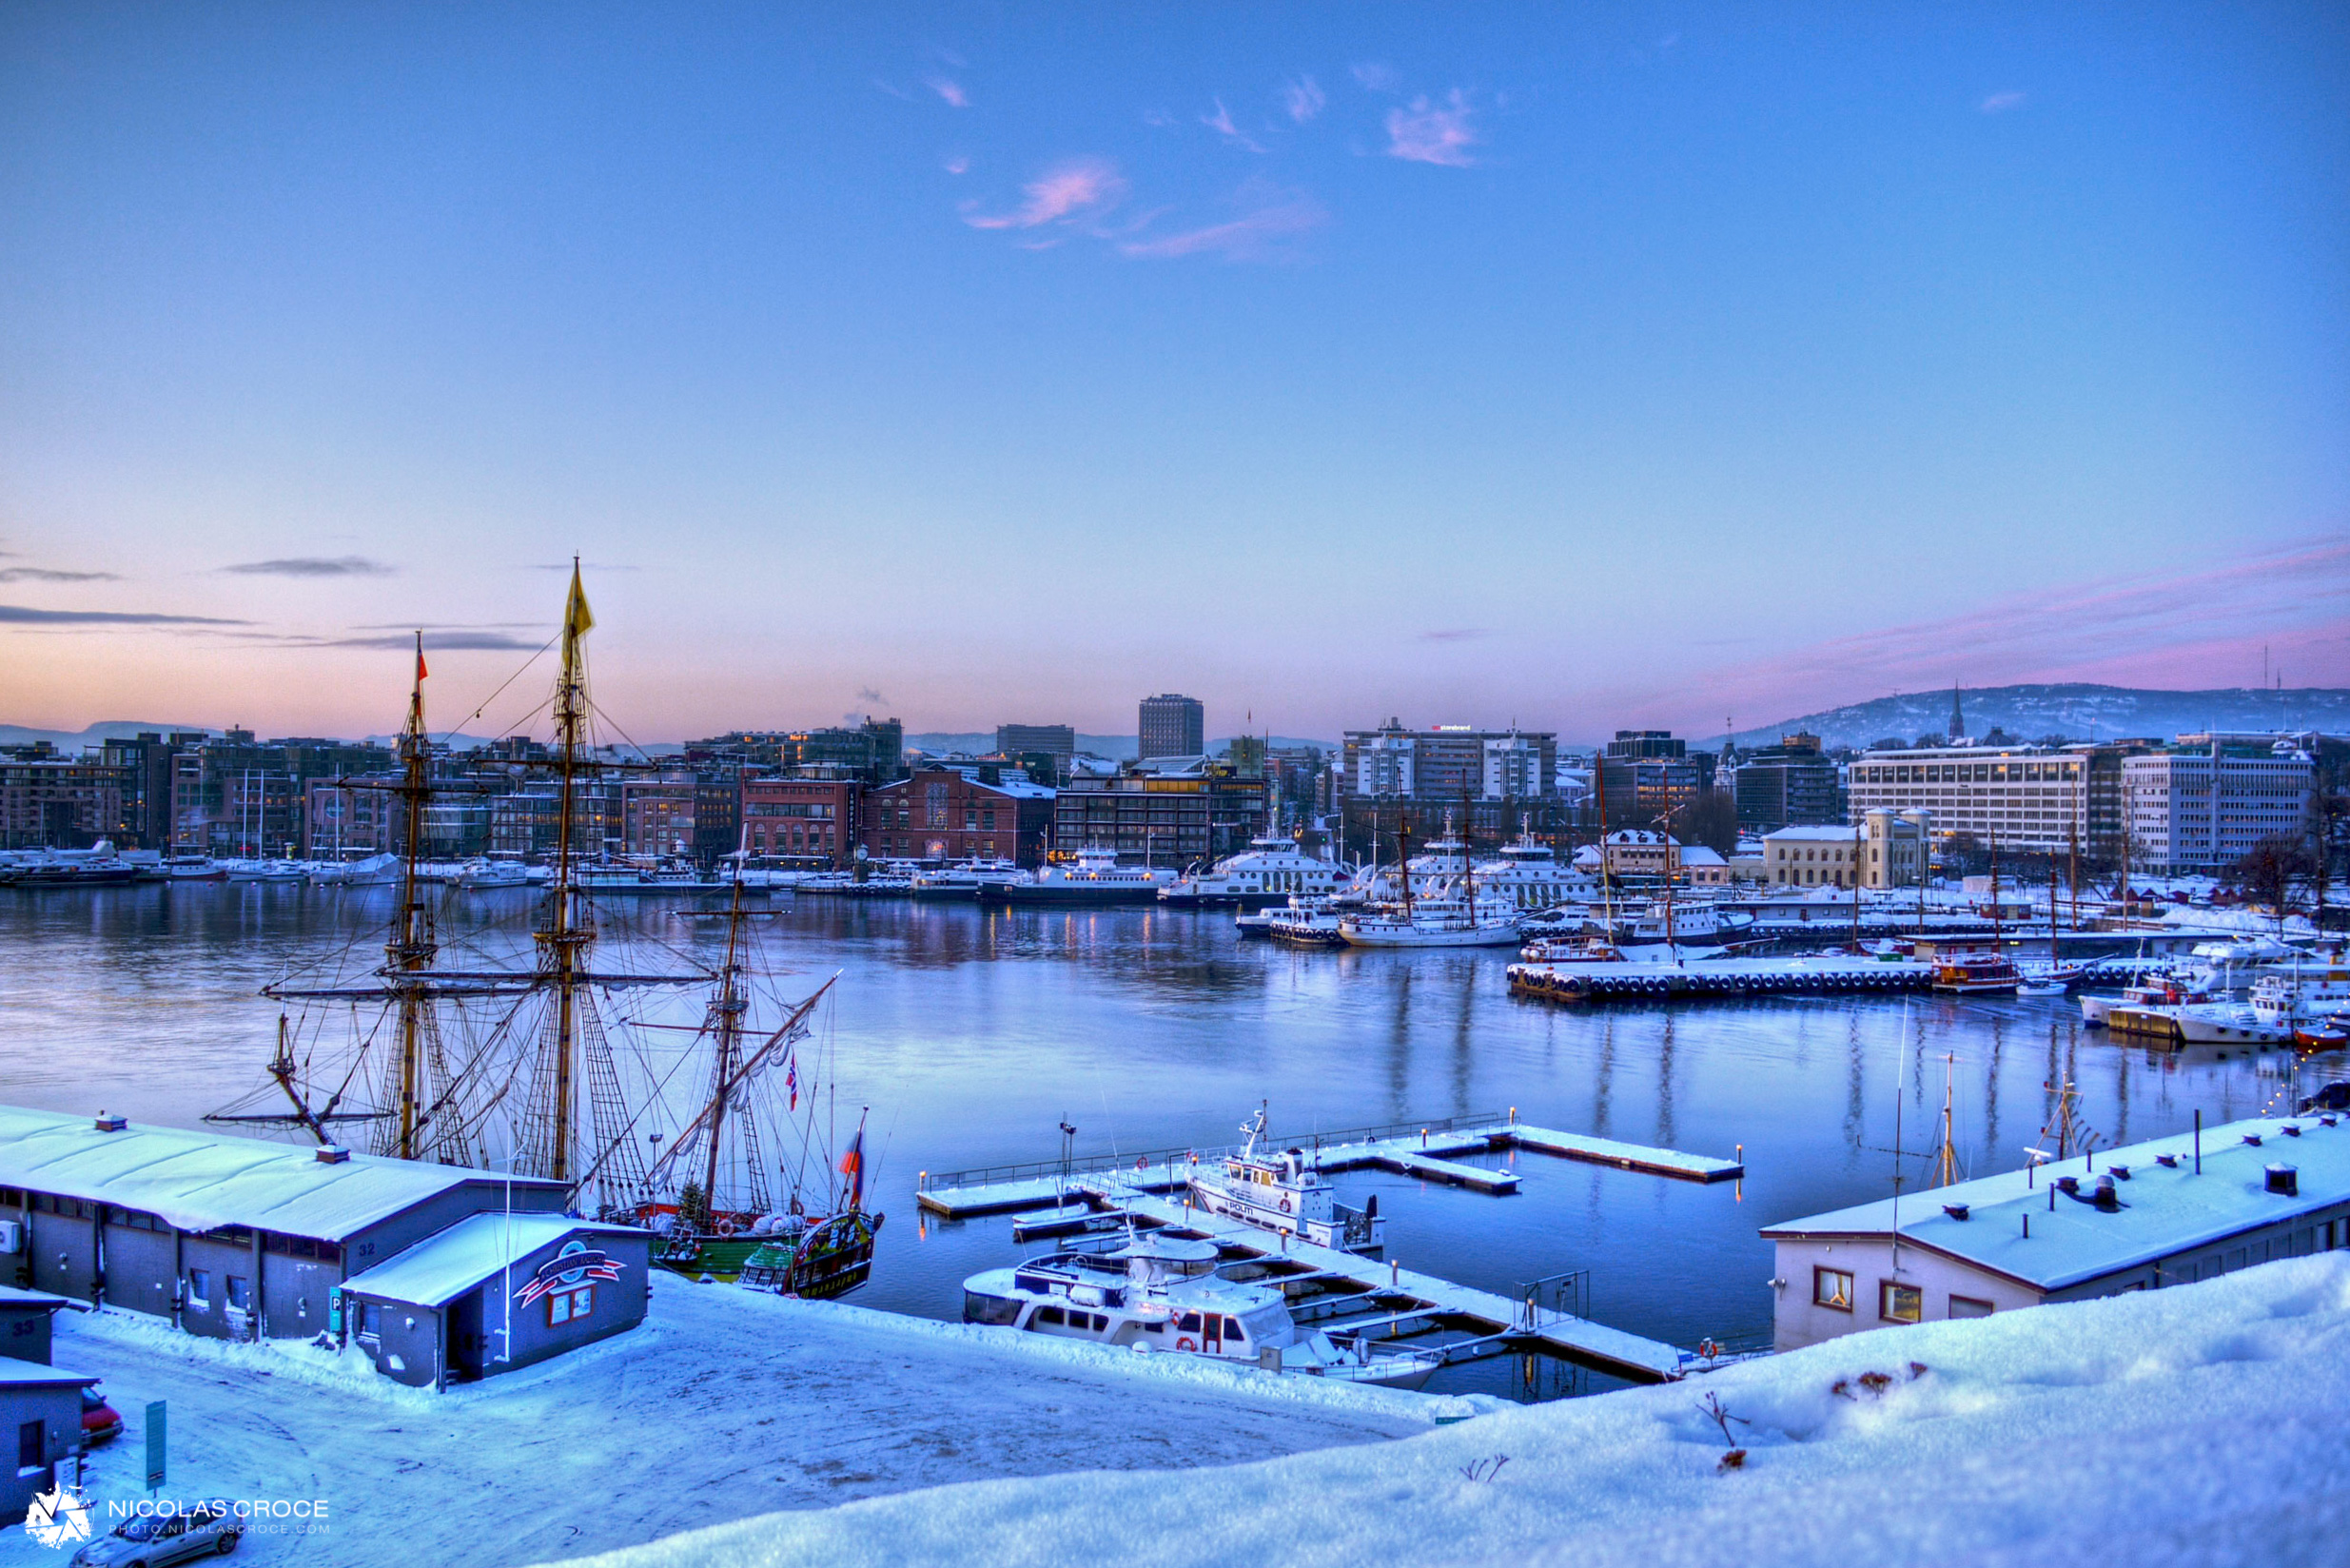 Oslo - Aker Bridge - HDR